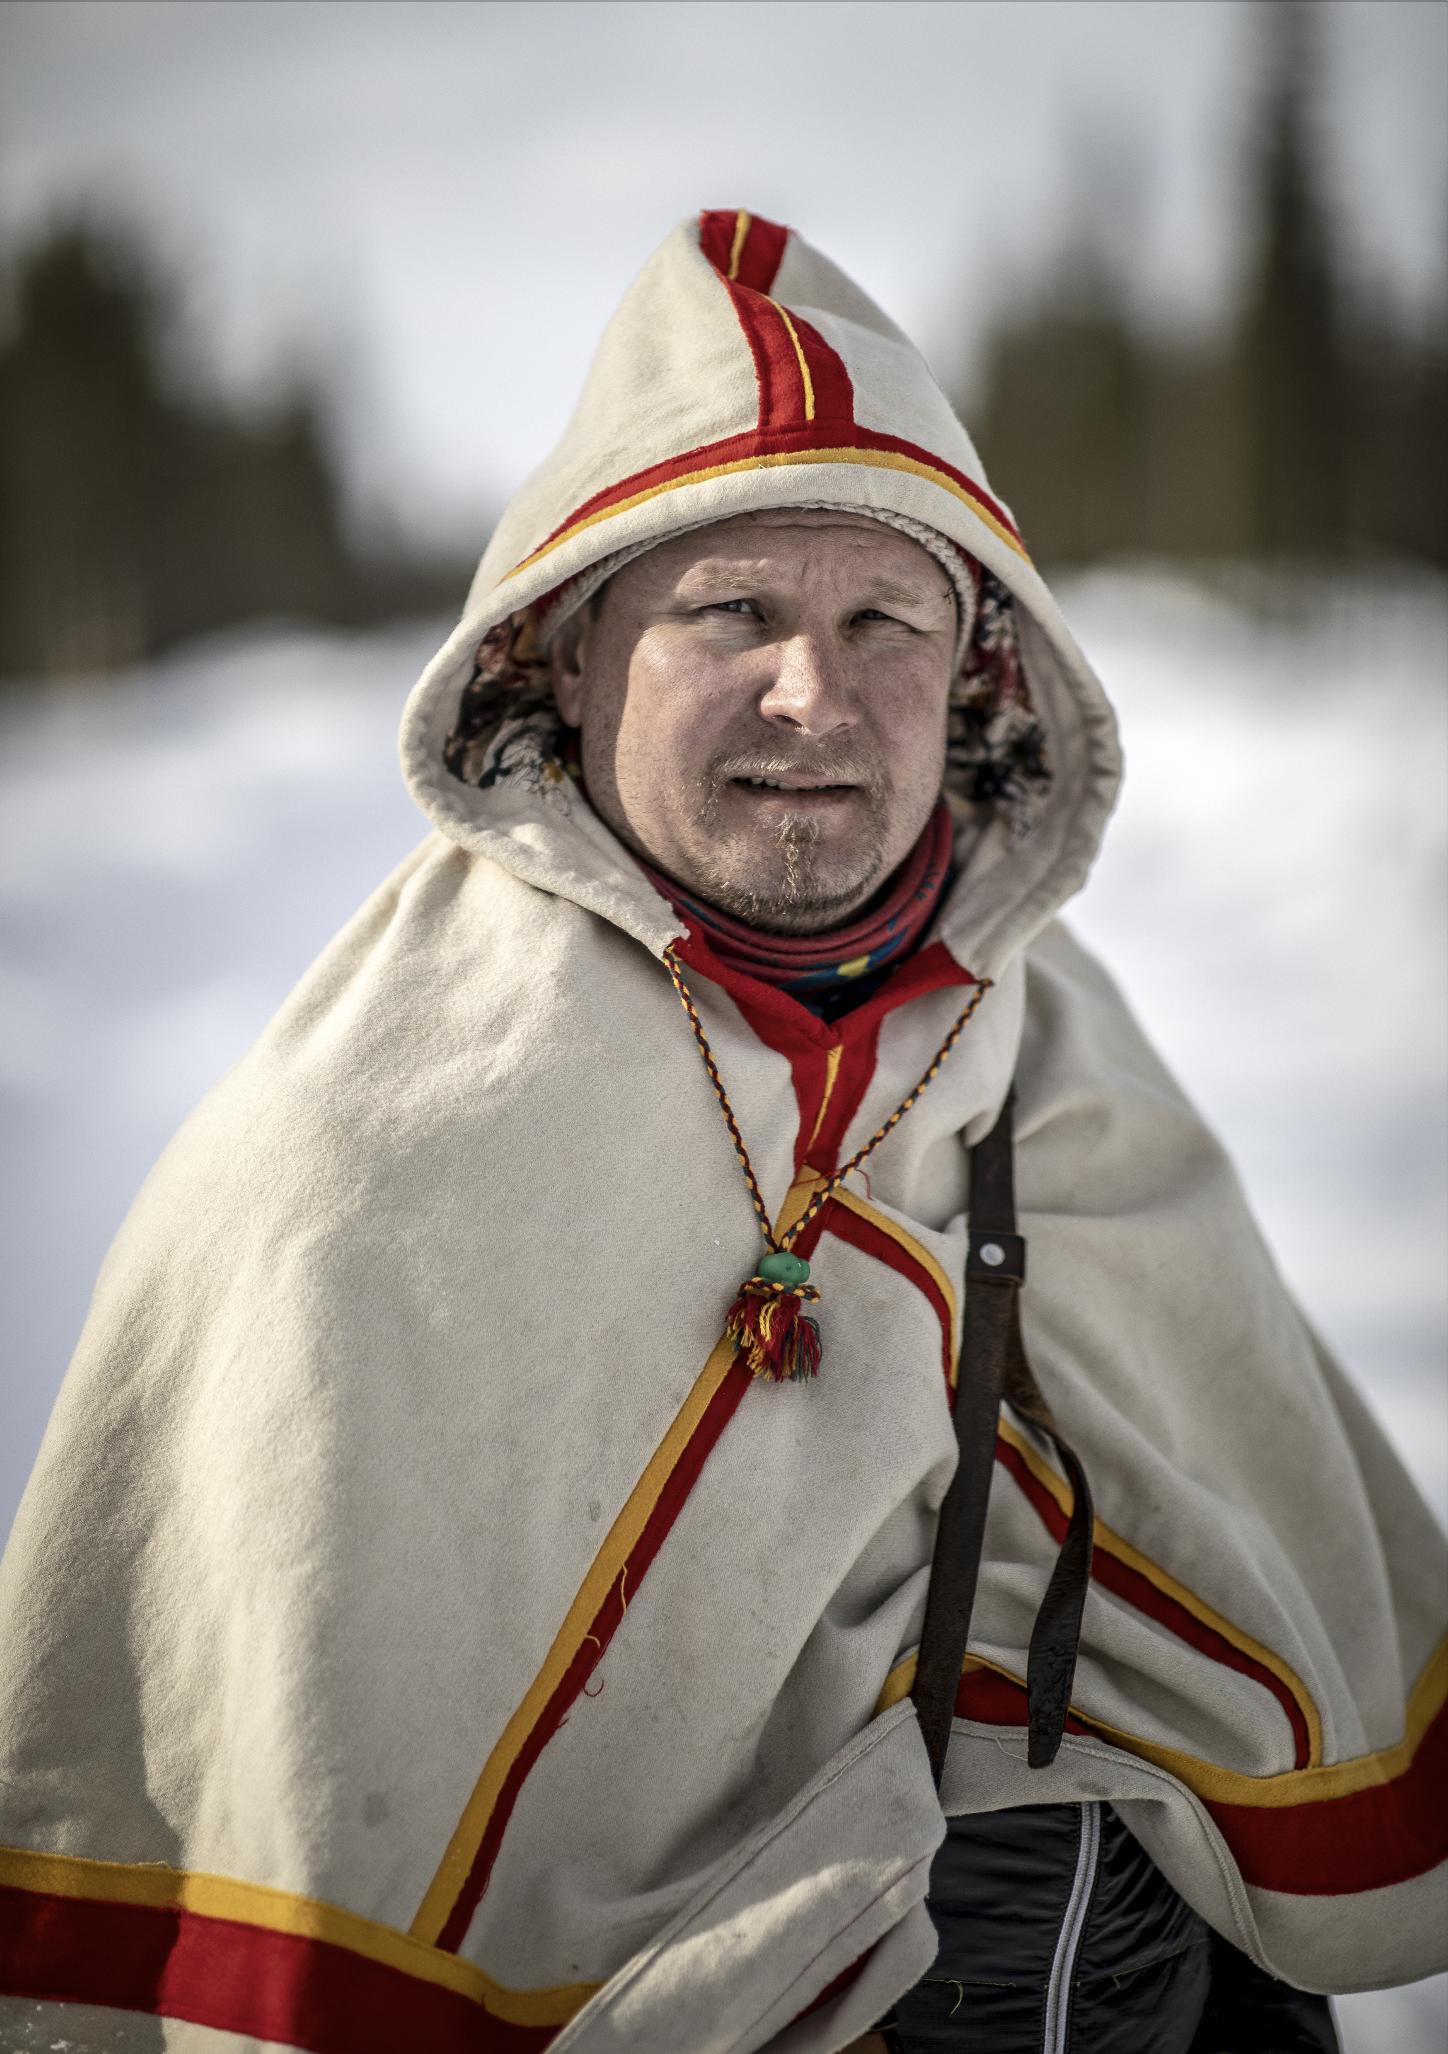 Lars Ánte Kuhmunen